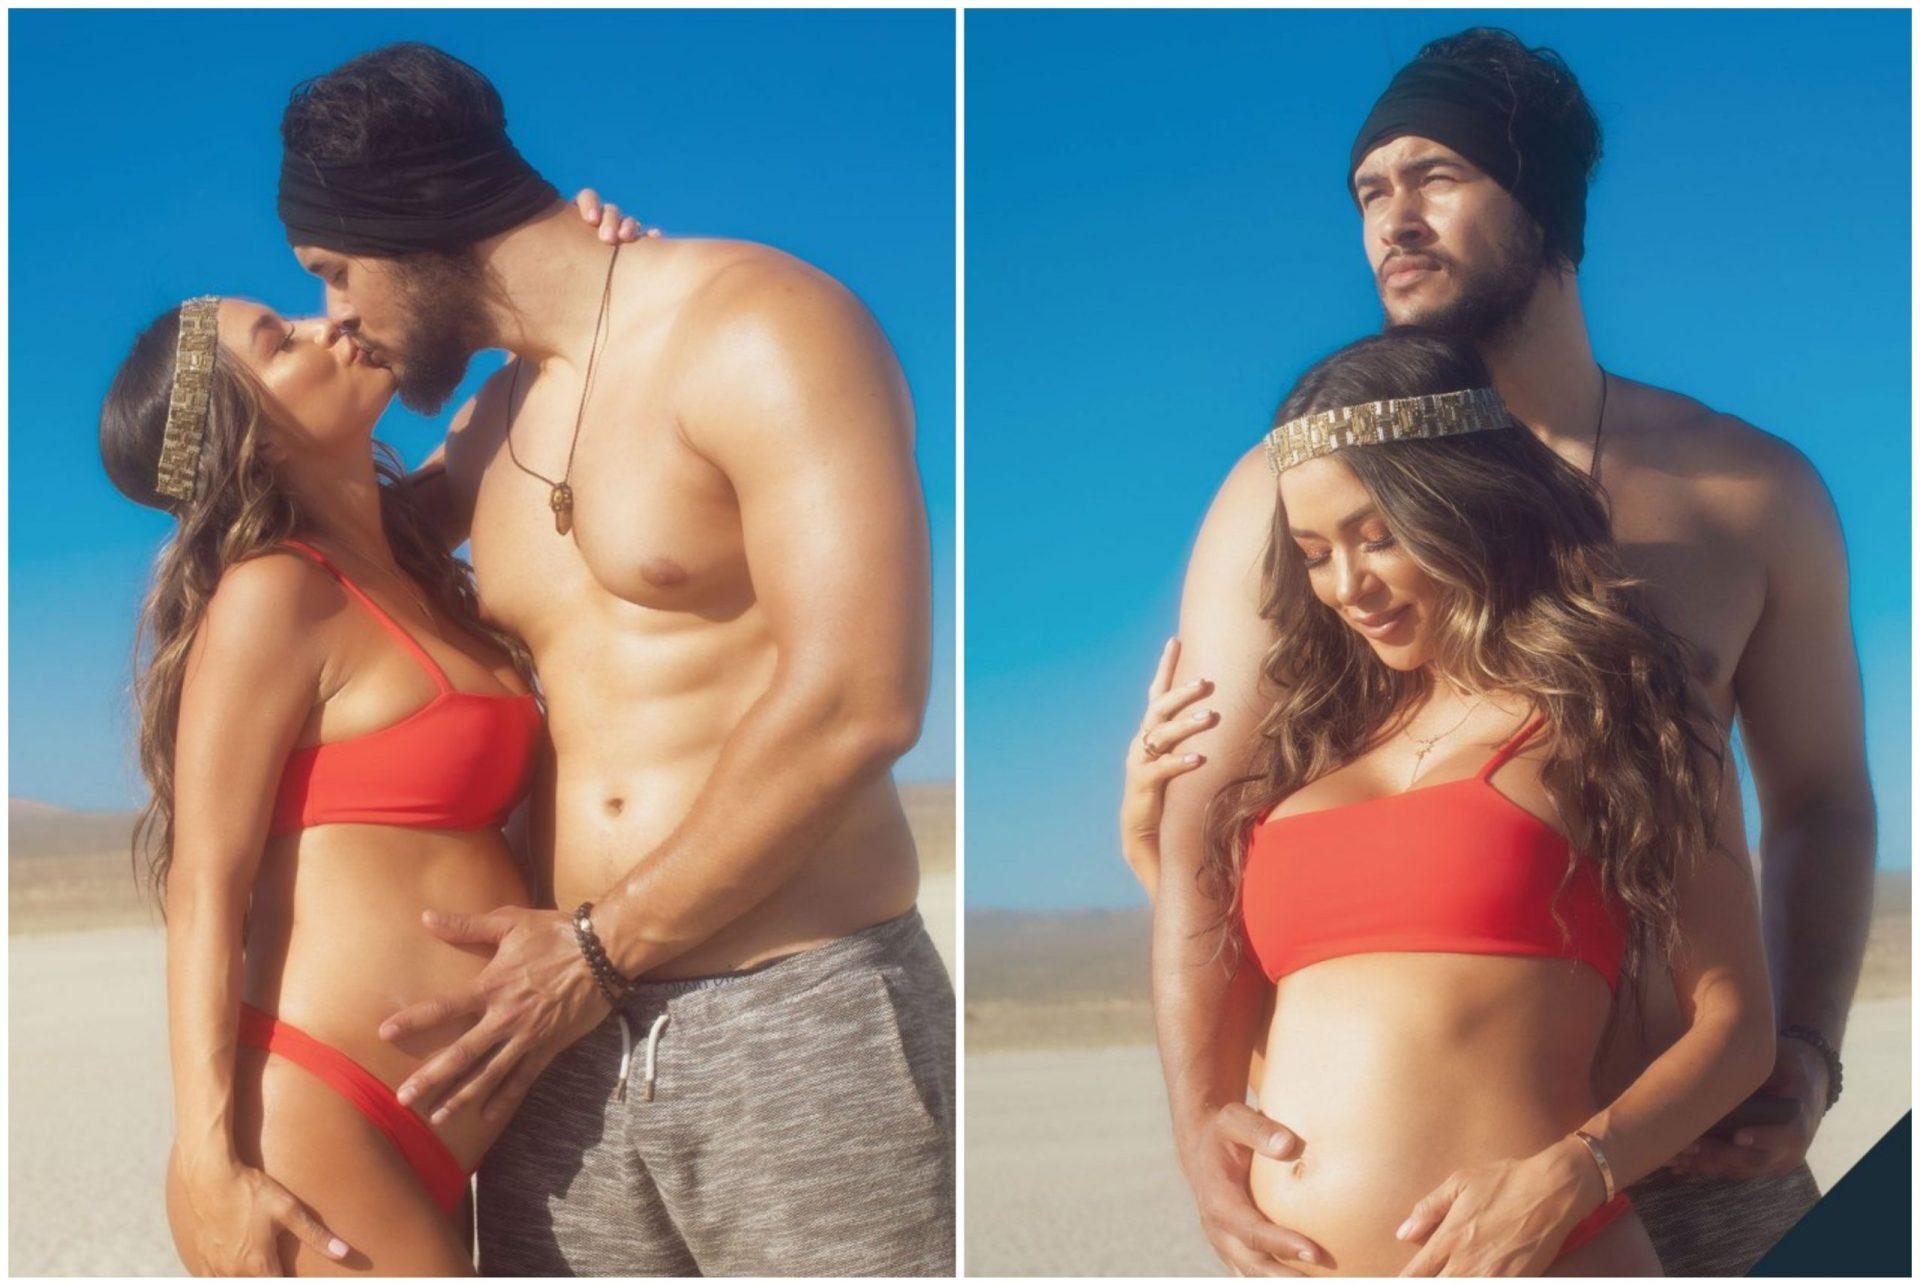 UFC Octagon girl Arianny Celeste announces pregnancy with steamy photoshoot! - Arianny Celeste